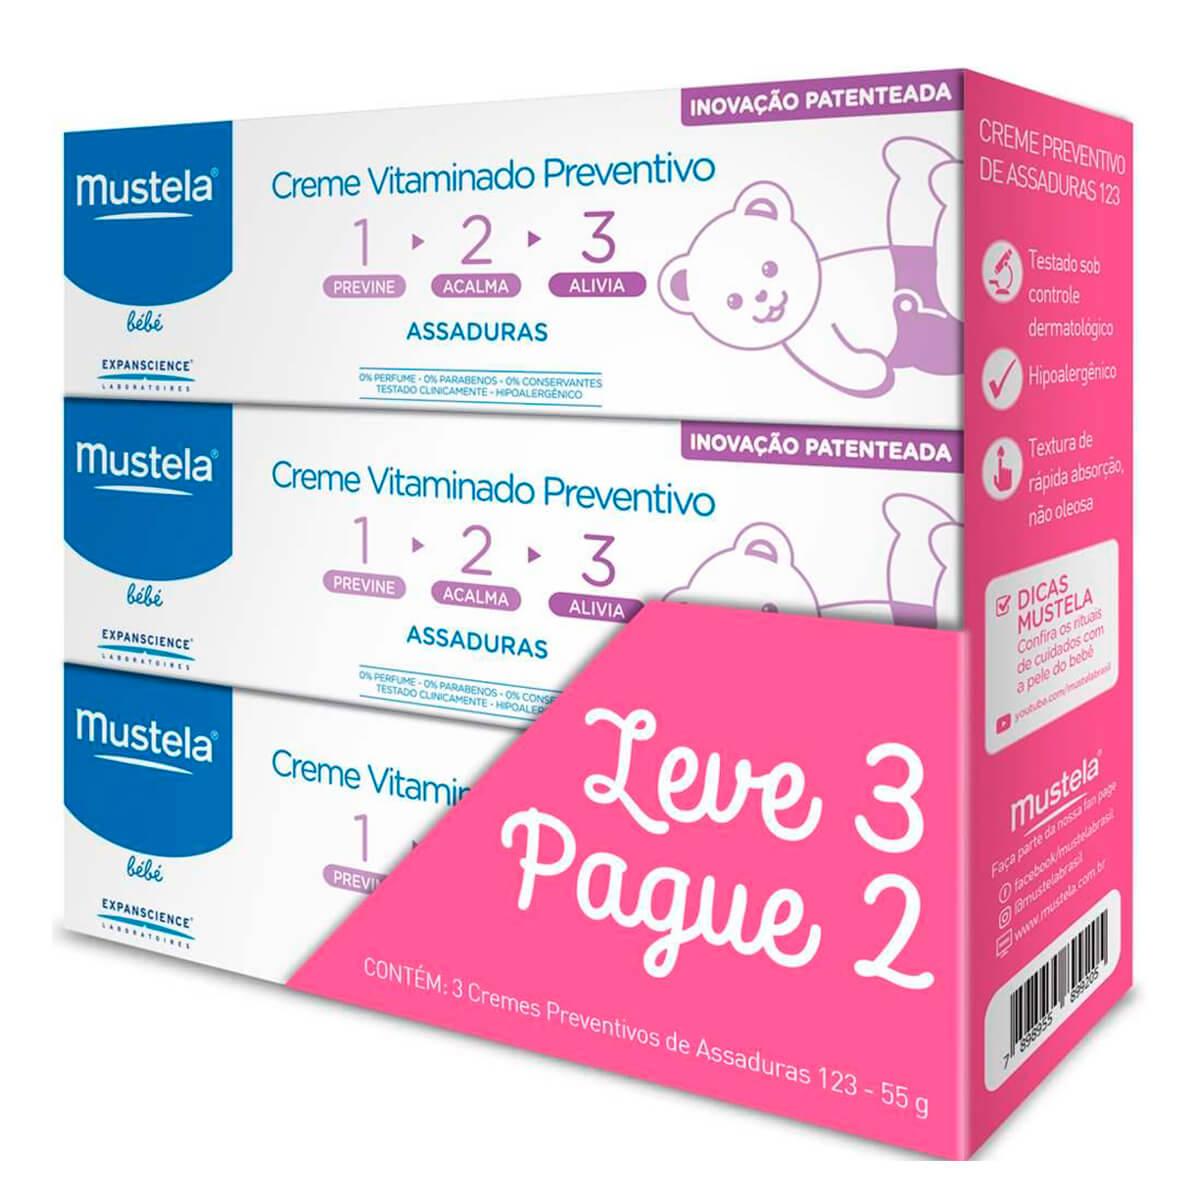 Kit Creme Vitaminado Preventivo Mustela Baby 1-2-3 Assaduras Leve 3 Pague 2 1 Kit